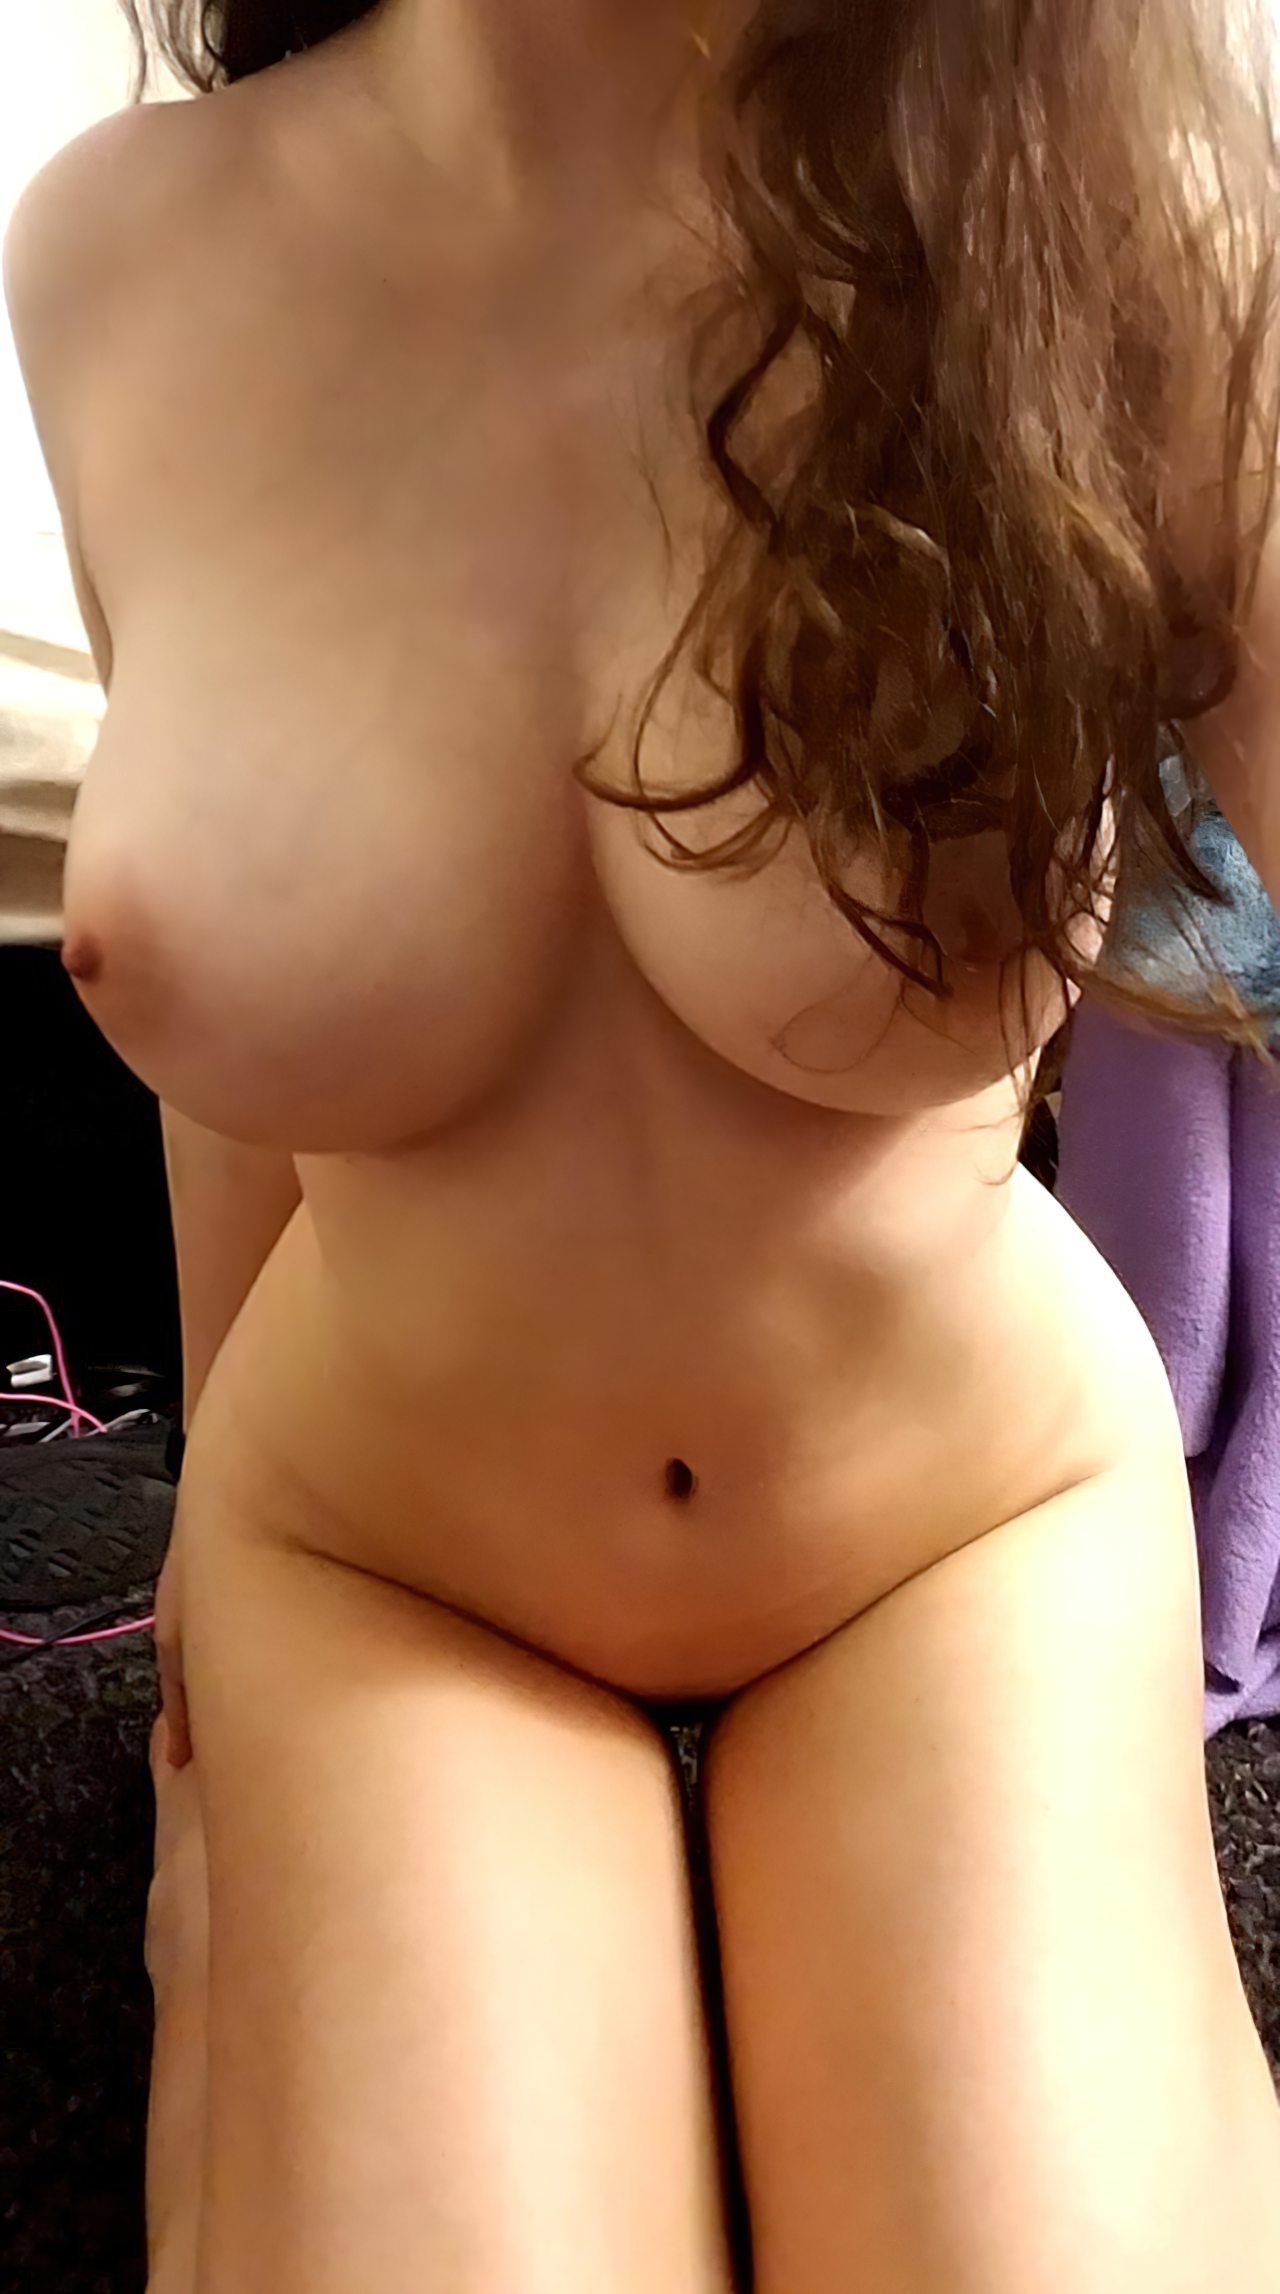 Fotos Mulheres Despidas (20)